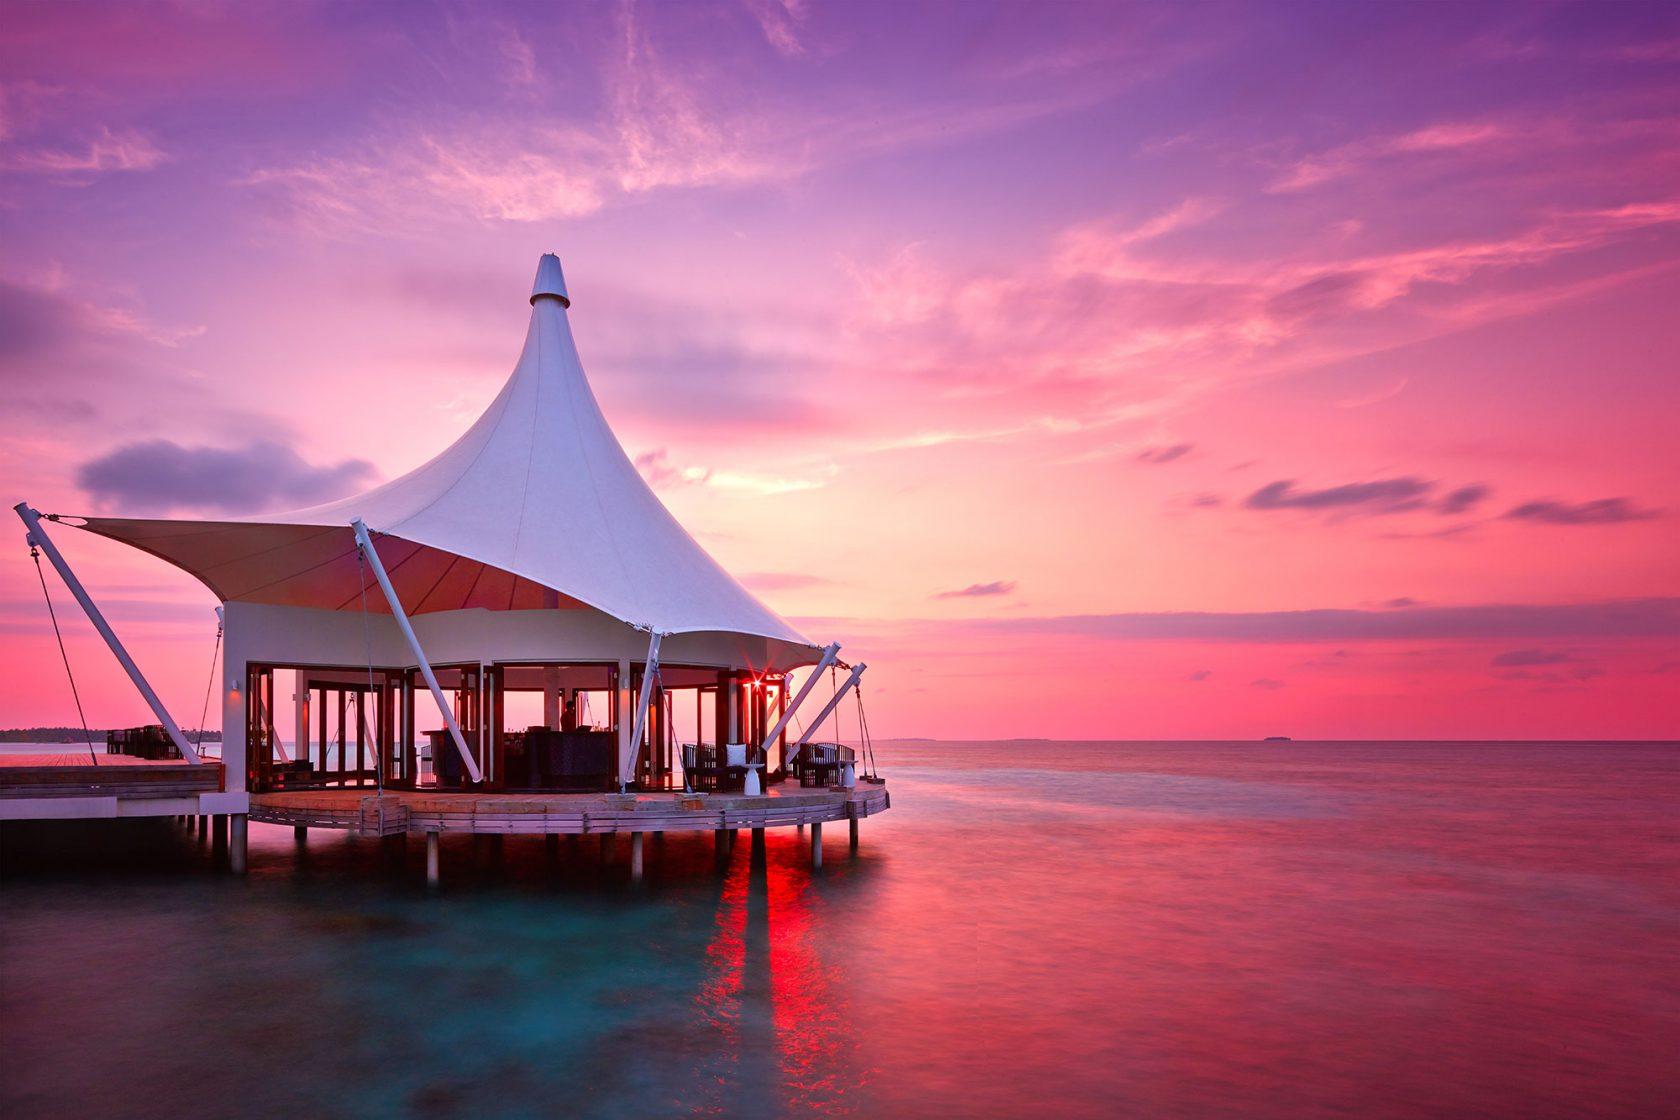 Niyama Island Resort Maldives Edge Sunset